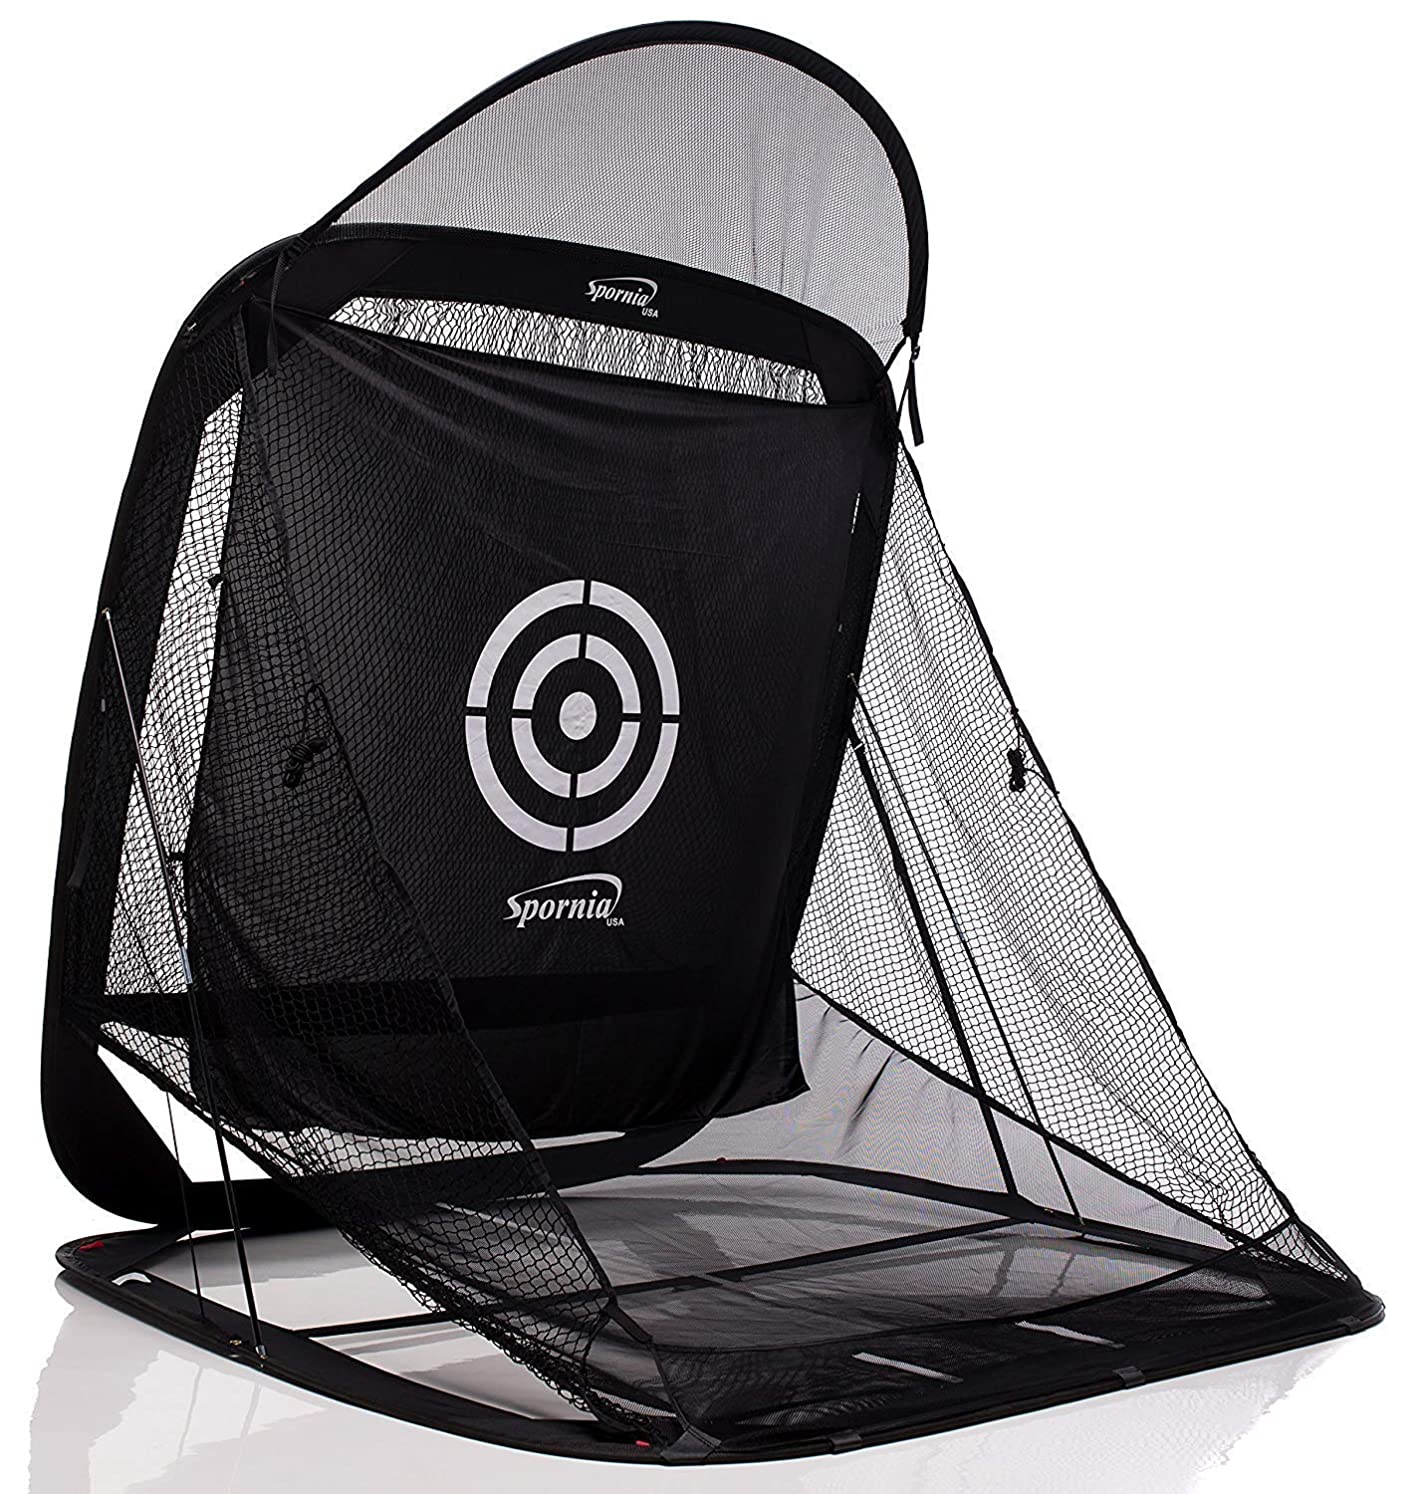 Spornia Spg-7 Golf Practice Net - Automatic Ball Return System w/Target Sheet, Two Side Barrier wihldhddn1968000